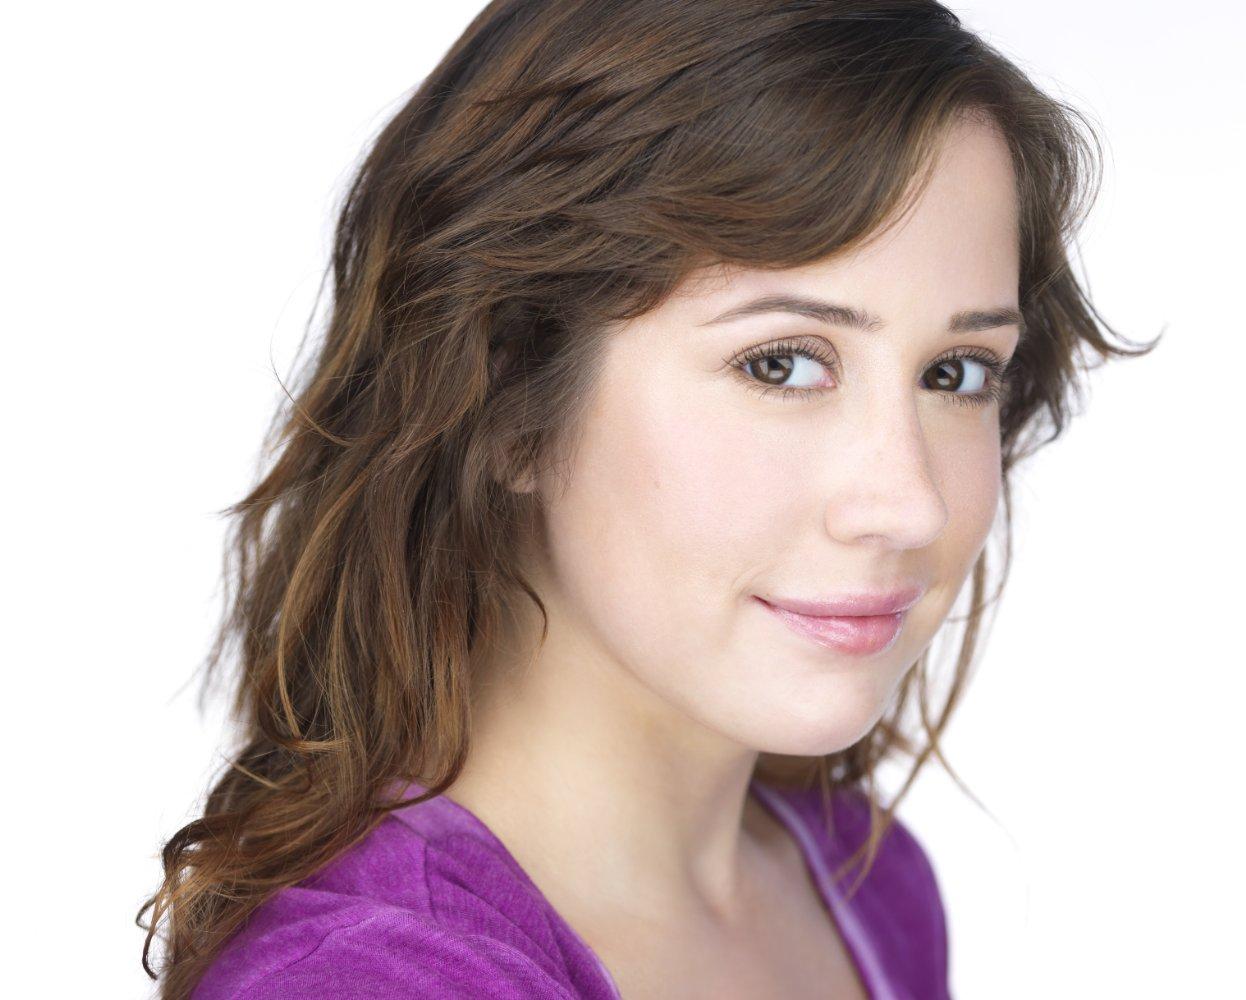 Leah Wiseman